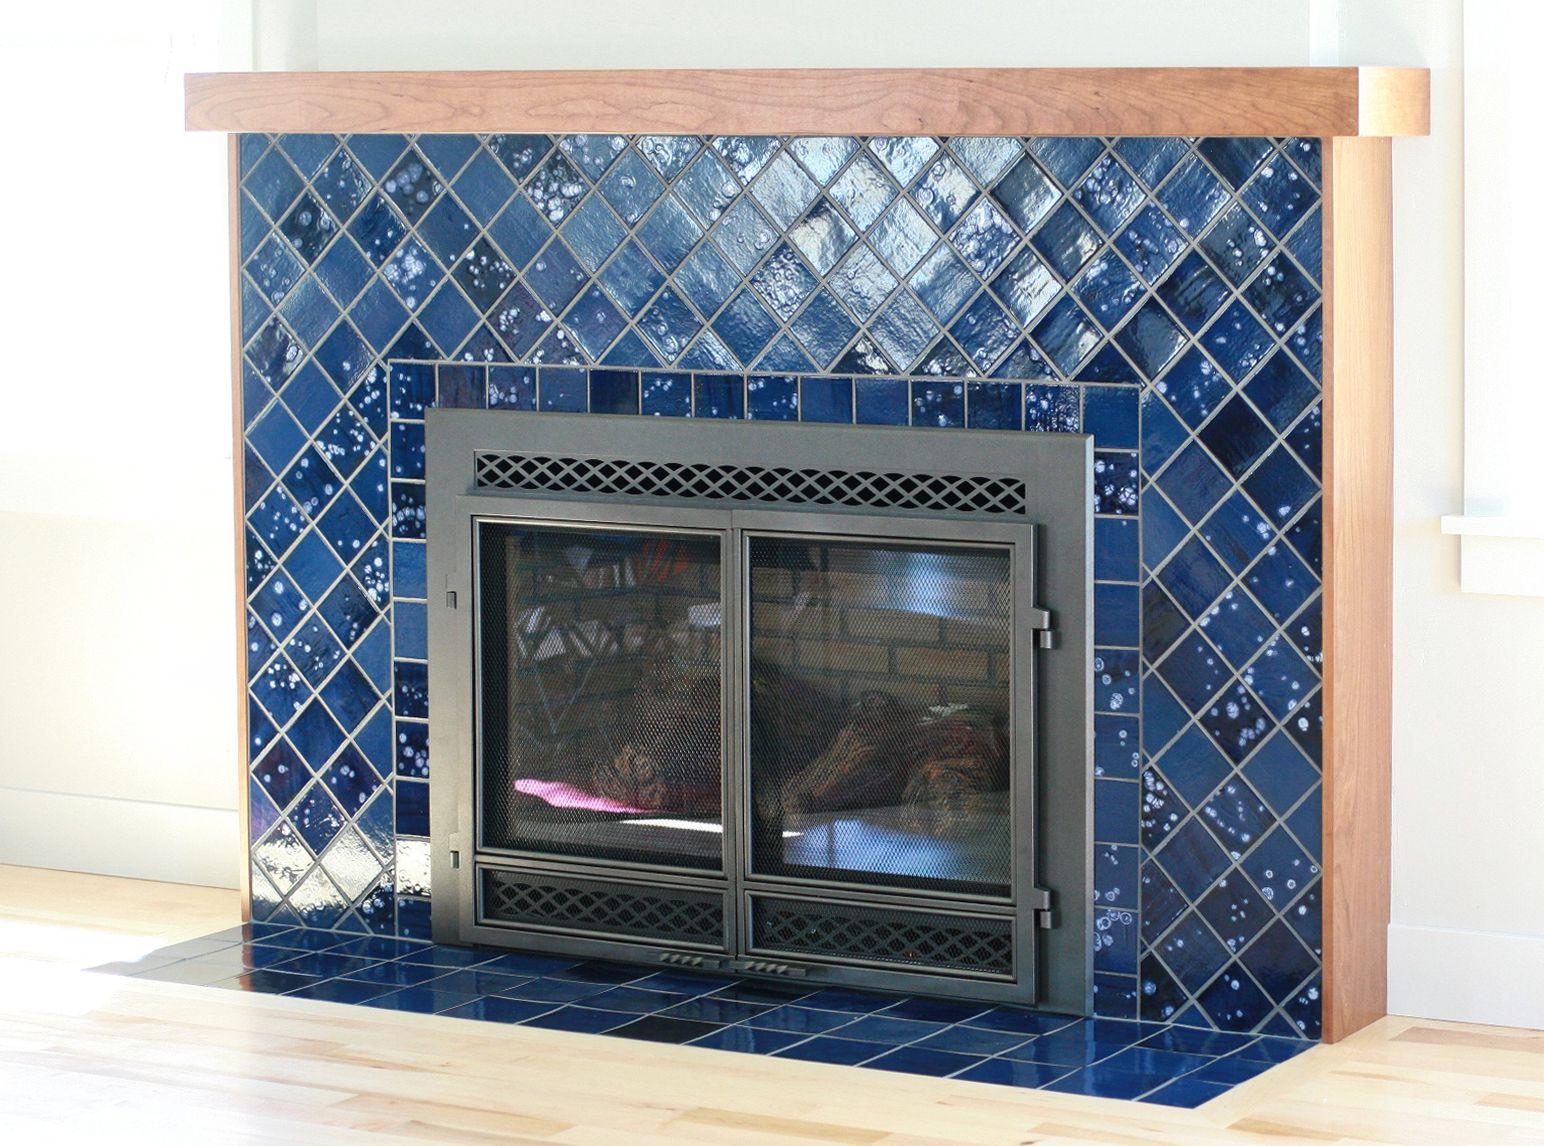 Northern Lights Tile Fireplace | Pinterest | Mosaic fireplace, Tile ...